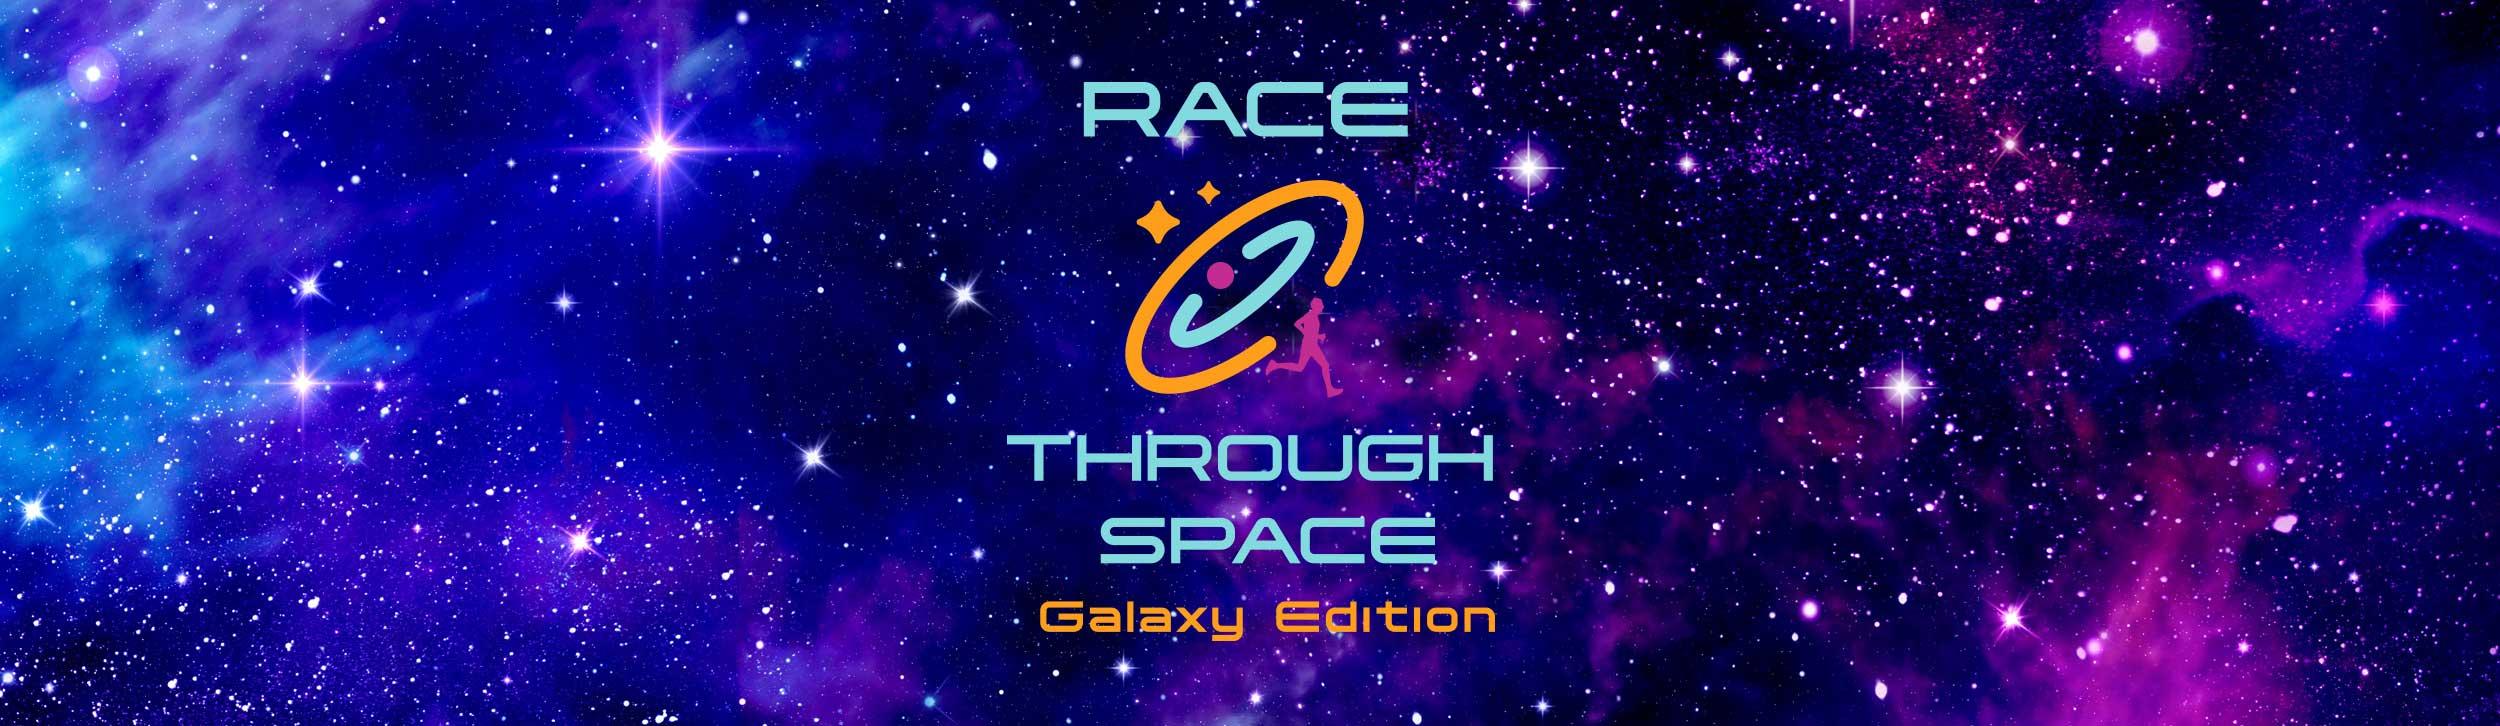 Race Through Space Galaxy Edition